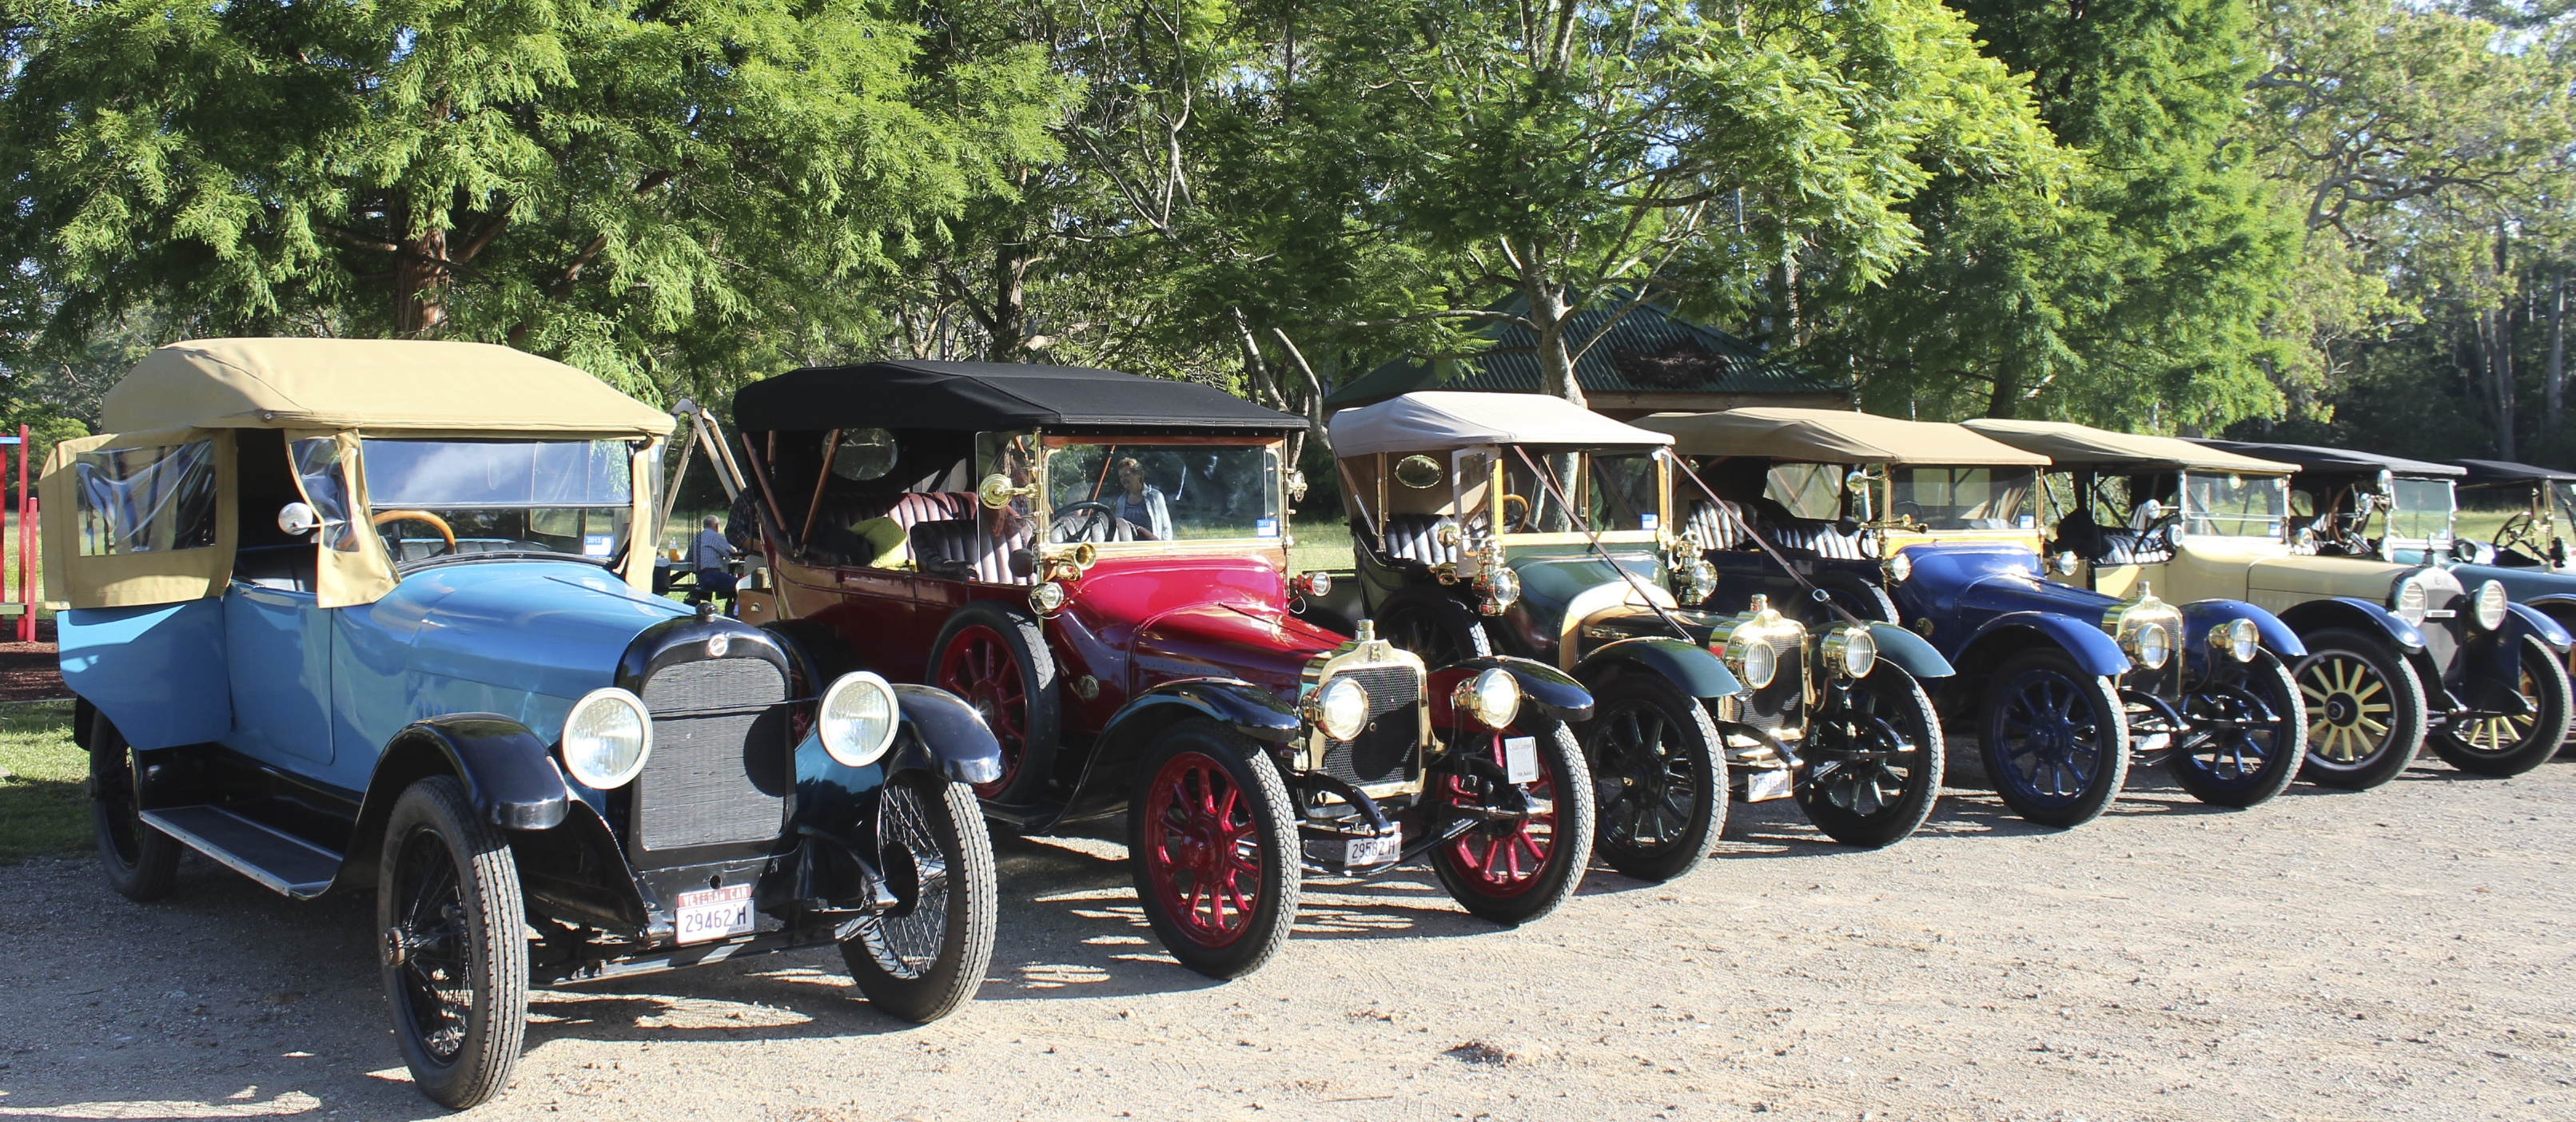 1918 Studebaker, Talbot x 3